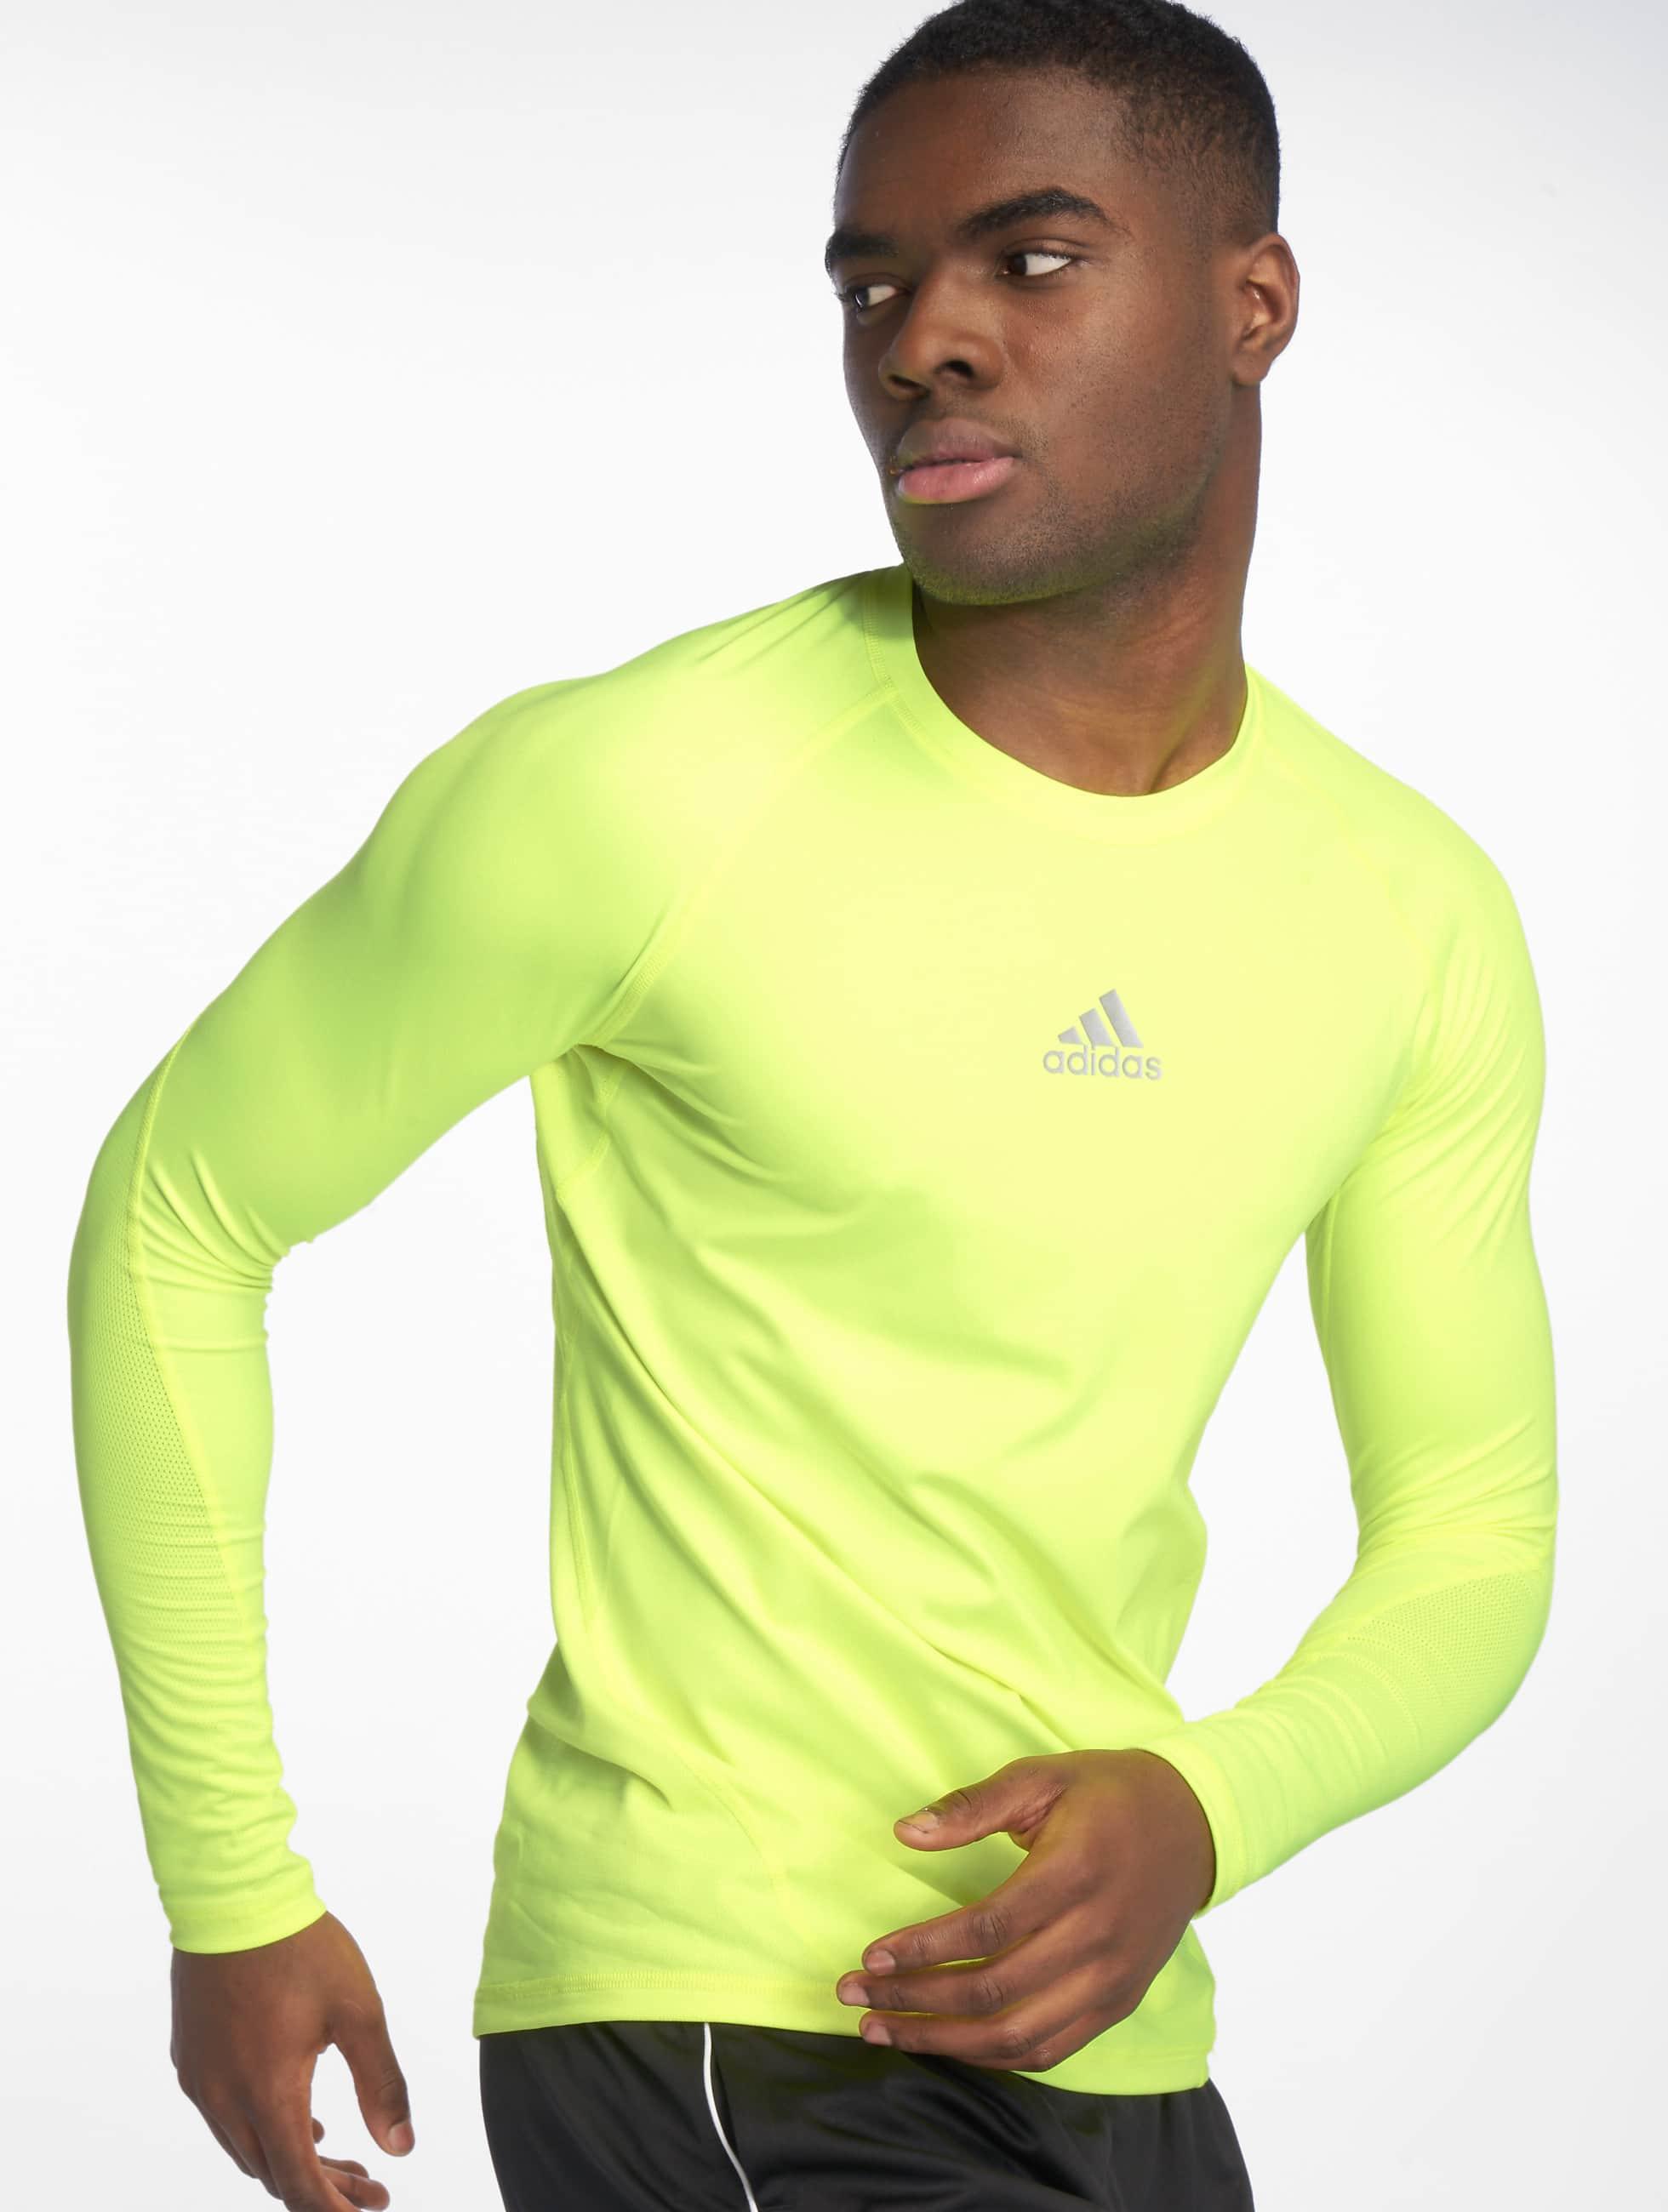 Adidas Alphaskin Alphaskin Longsleeve Adidas Yellow Solar Longsleeve nwk8P0O